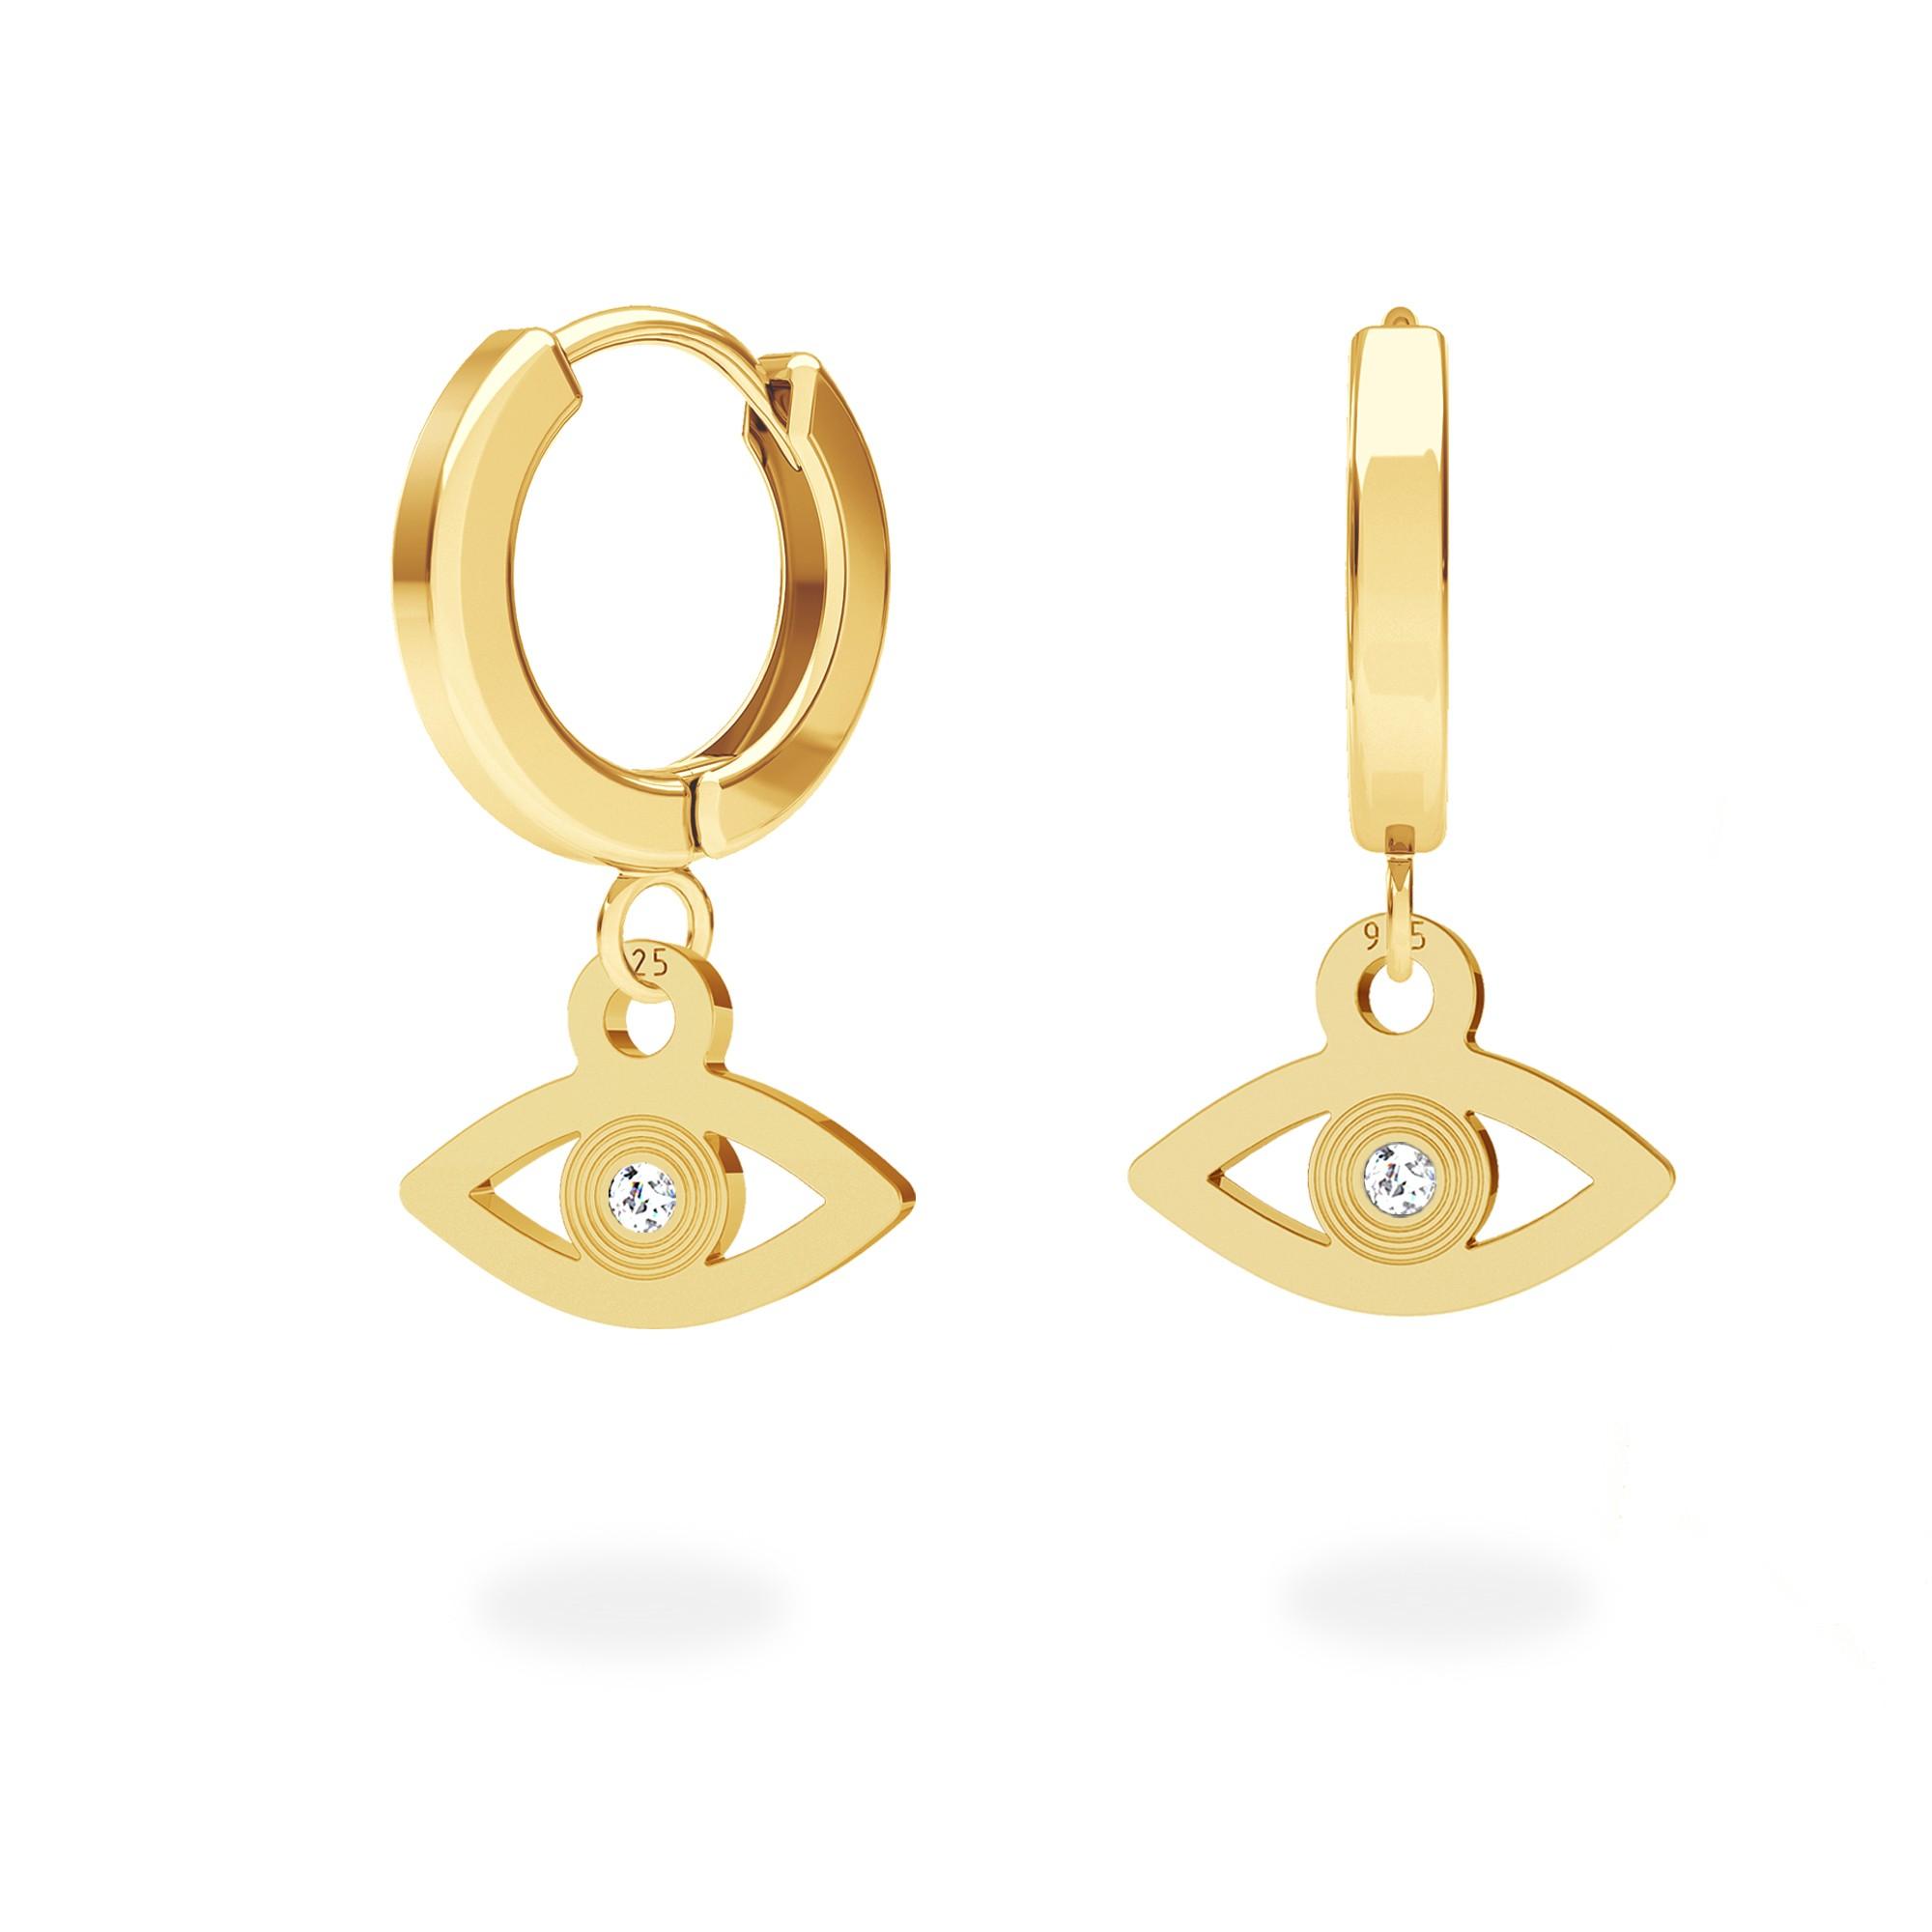 Eye earrings with Swarovski Crystals sterling silver 925